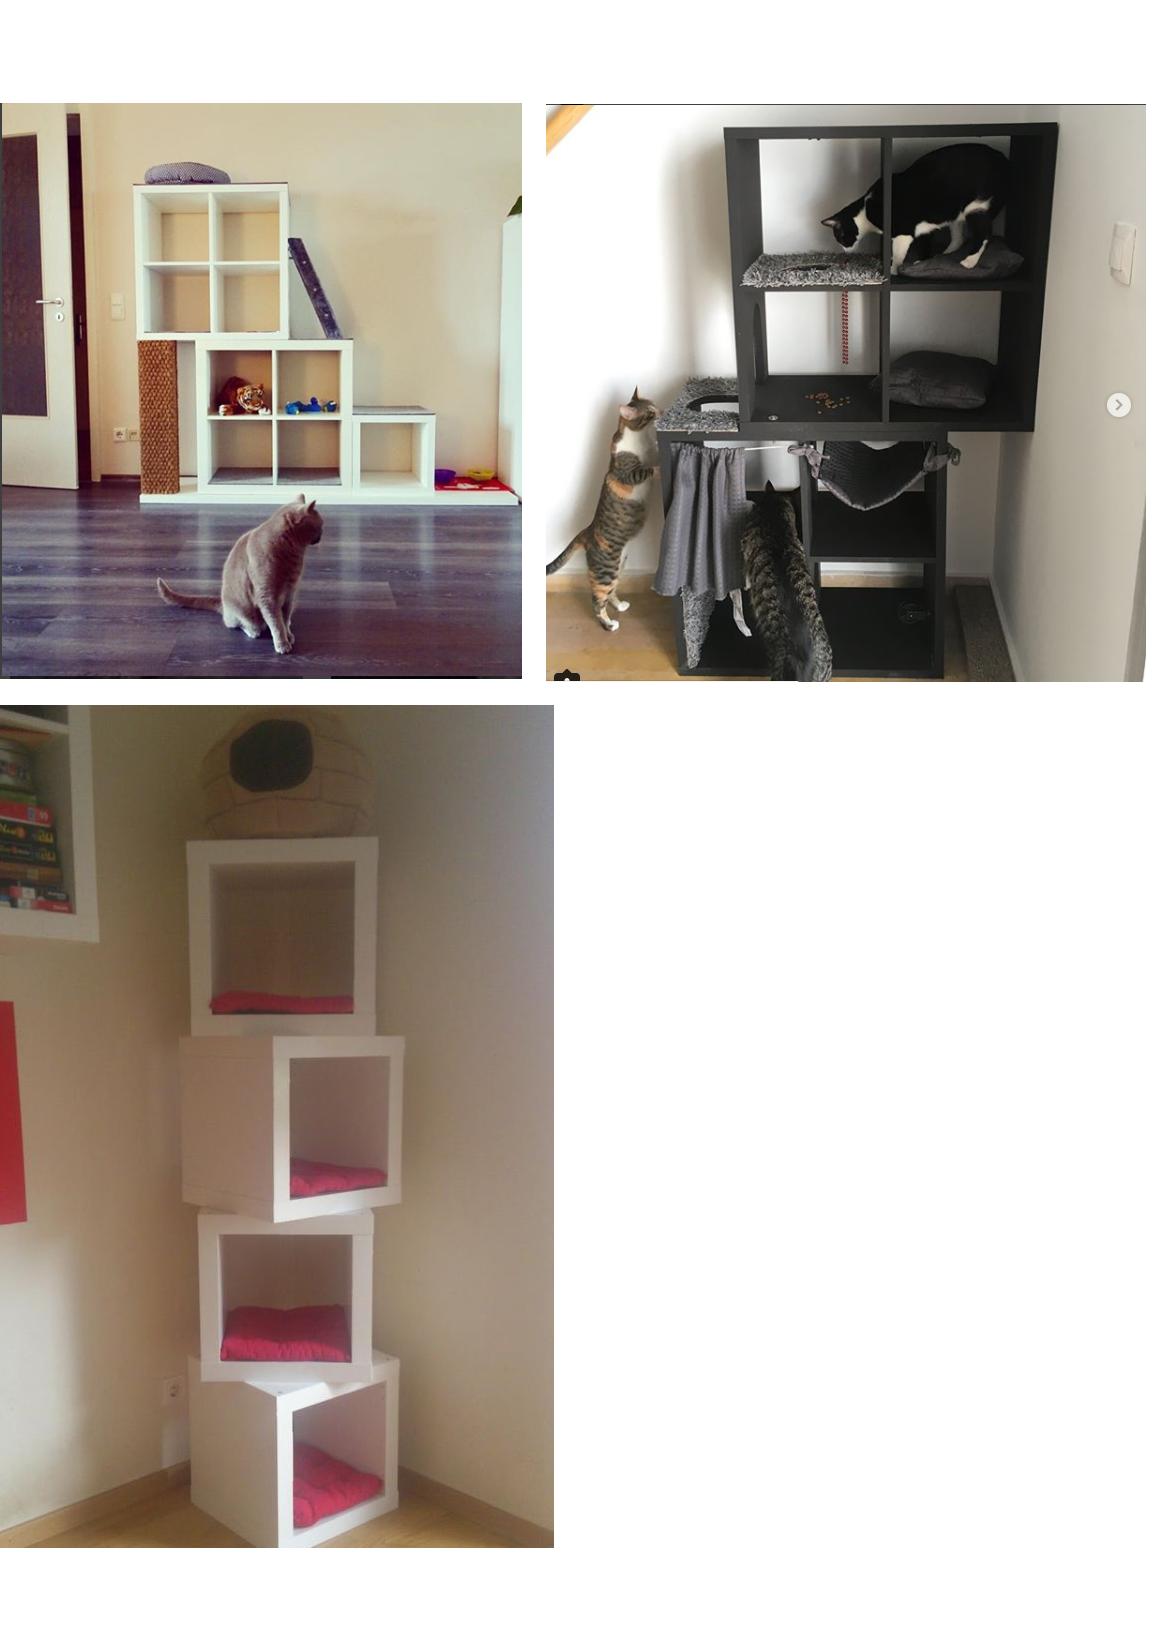 Ikea Kallax Cat Hack Idea Rental House Ikea Cat Cat Hacks Kallax